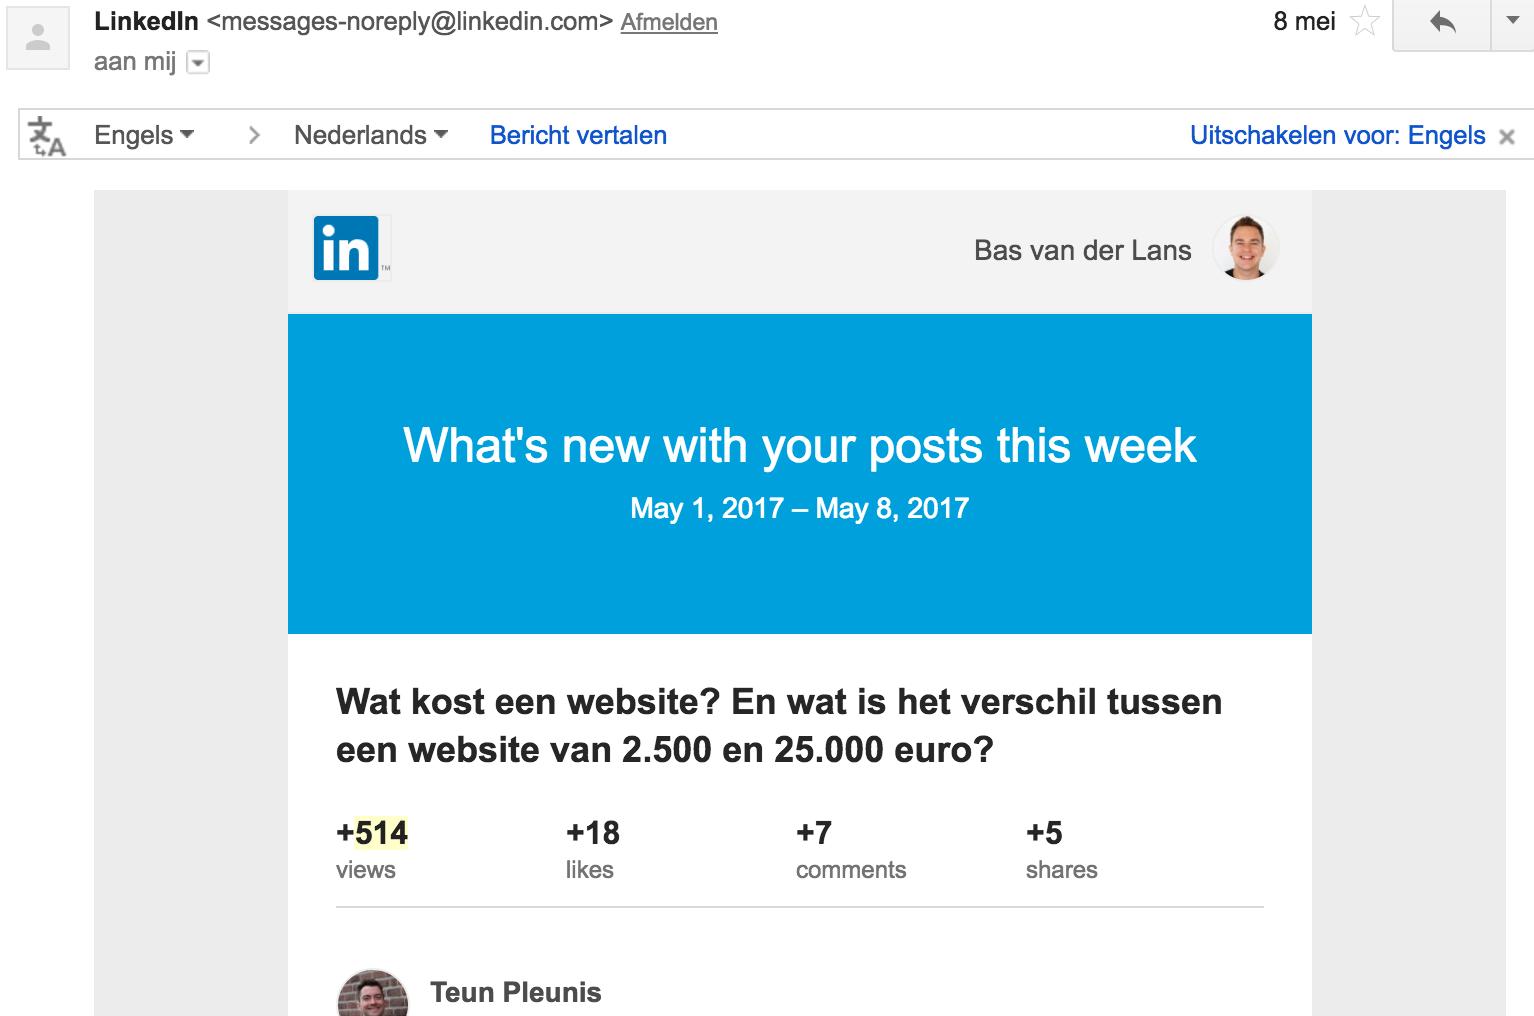 Gebruik jij jouw WordPress Data zoals LinkedIn?